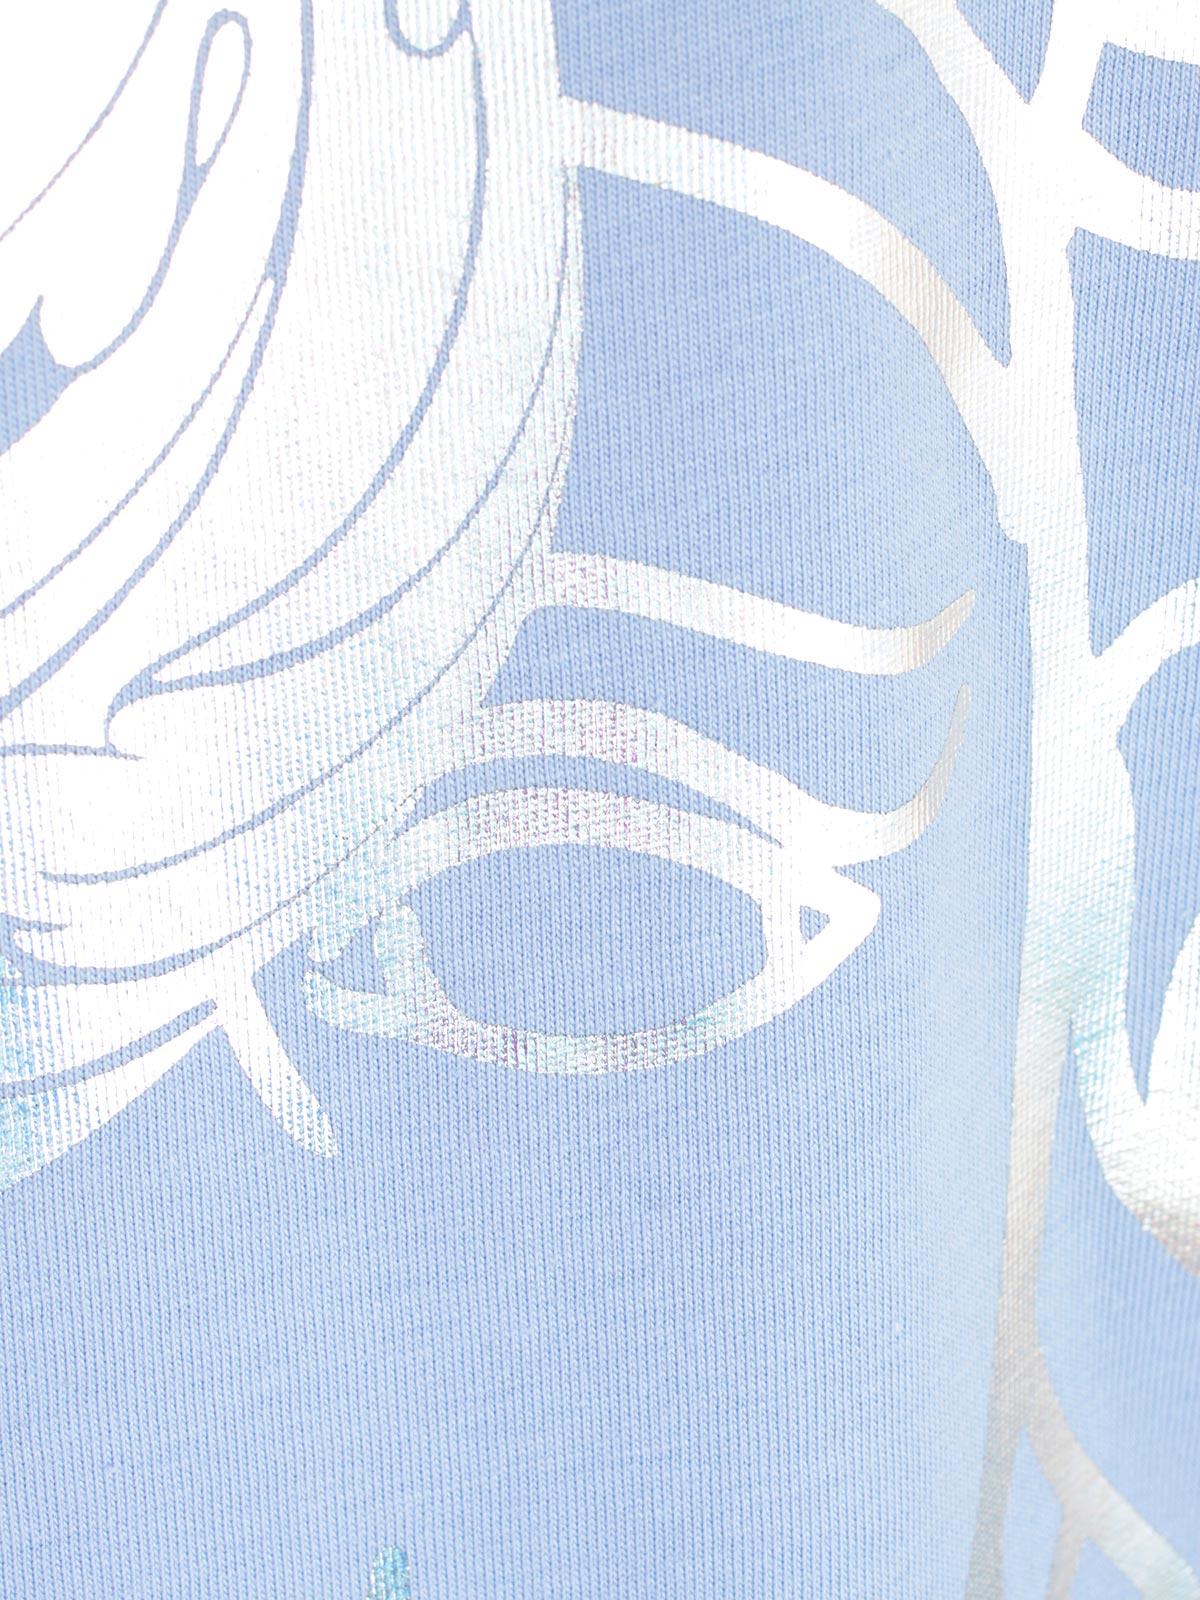 917c42c3a6c2 Versace Collection T- Shirt V800683R.VJ00567 - V7350 LIGHT BLUE ...